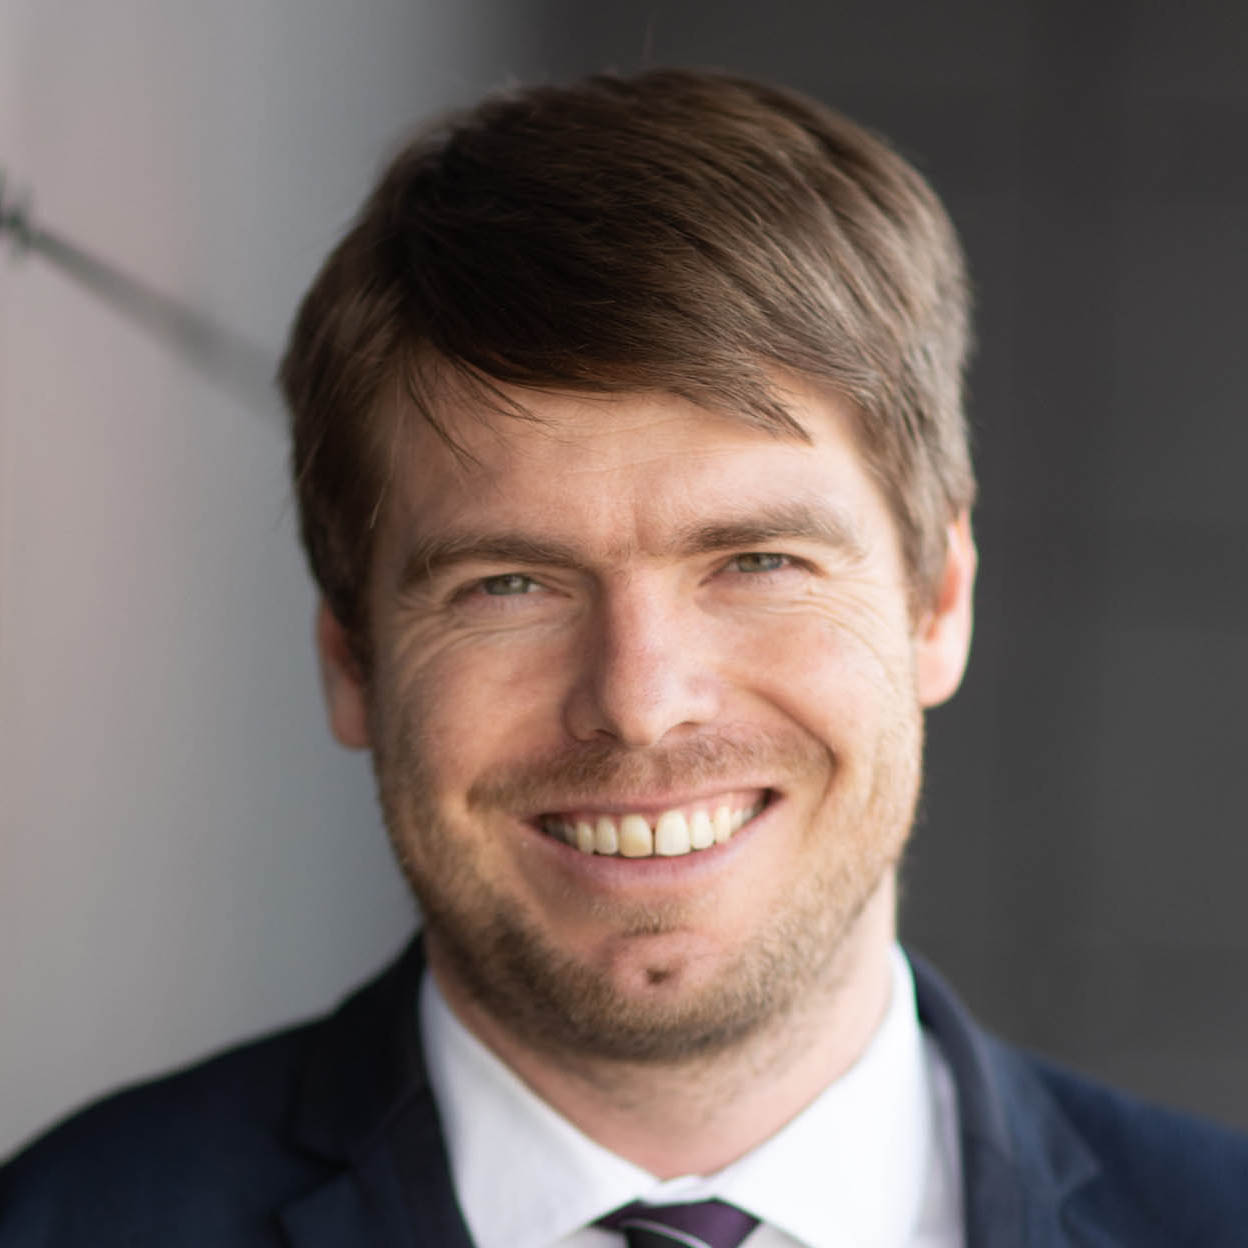 Jan Herget ředitel agentury CzechTourism